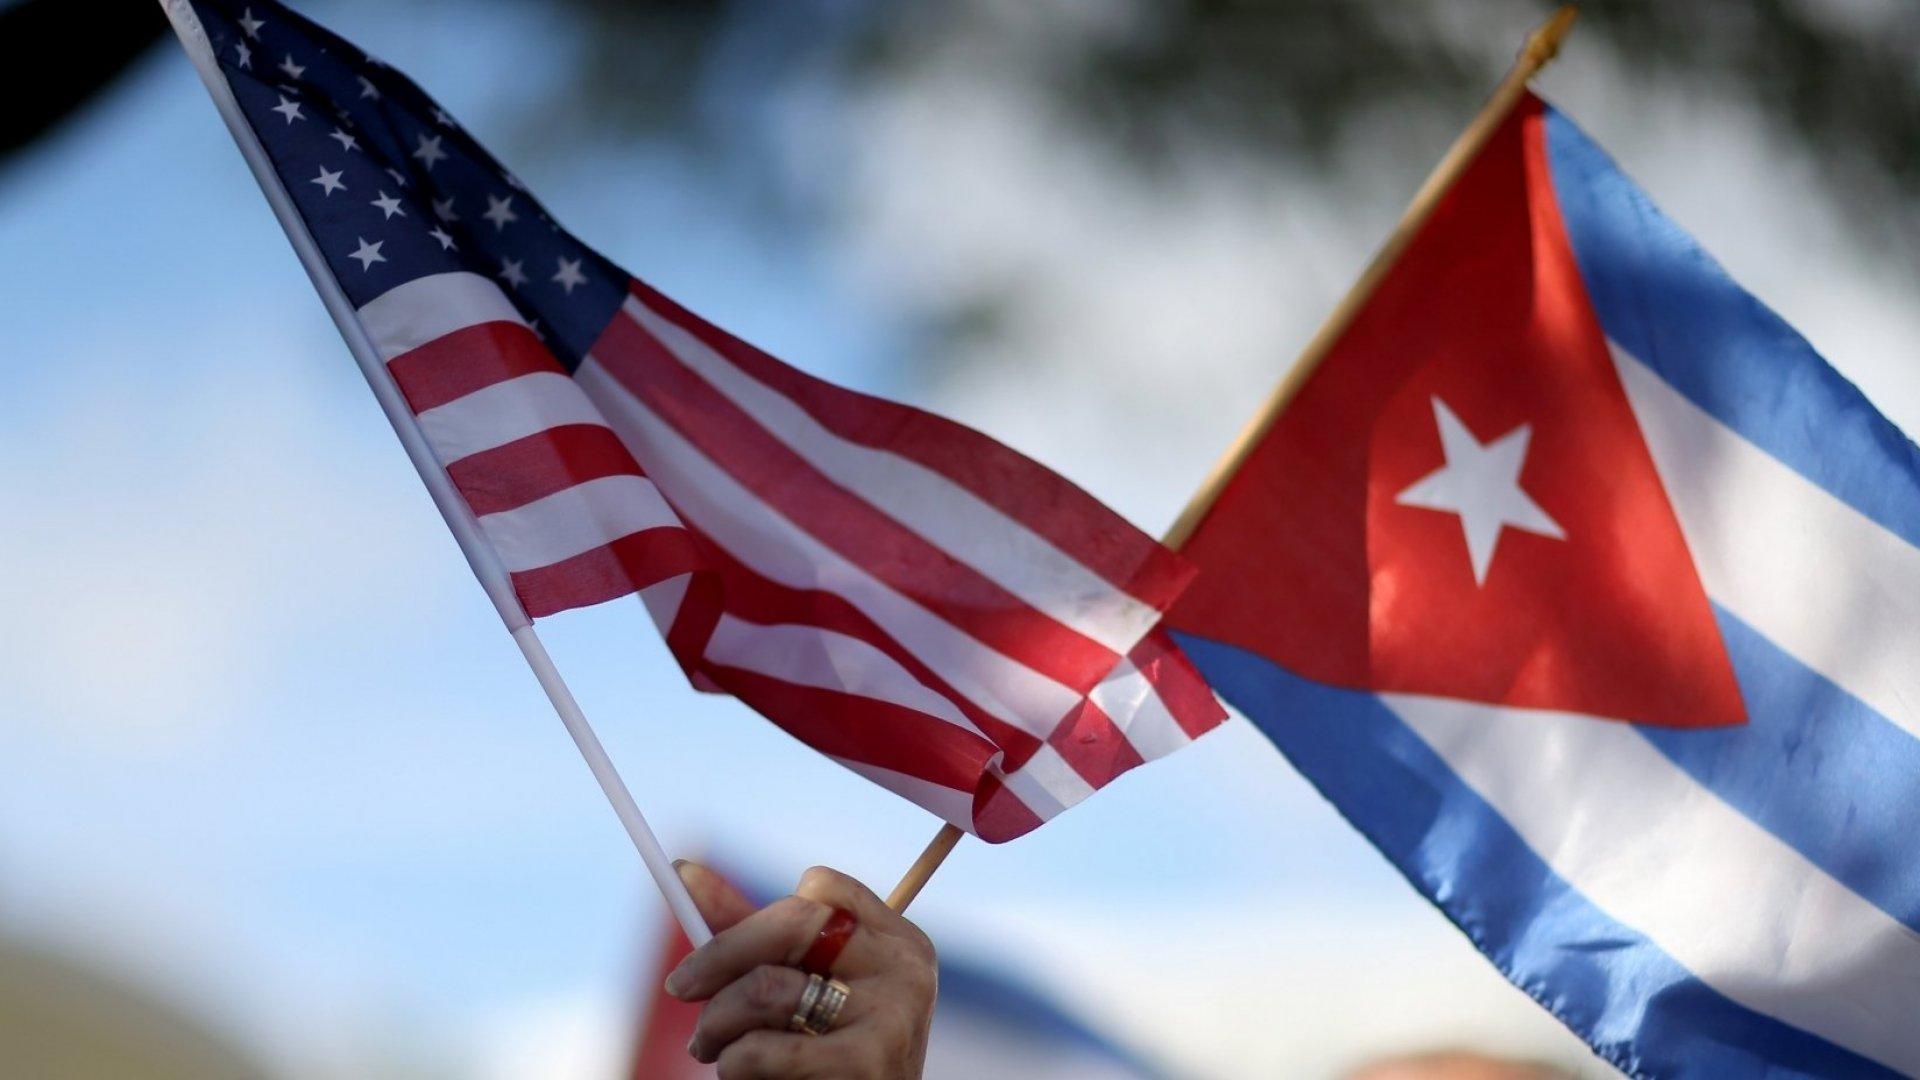 5 Decades Later, US-Cuba Diplomatic Ties Restored